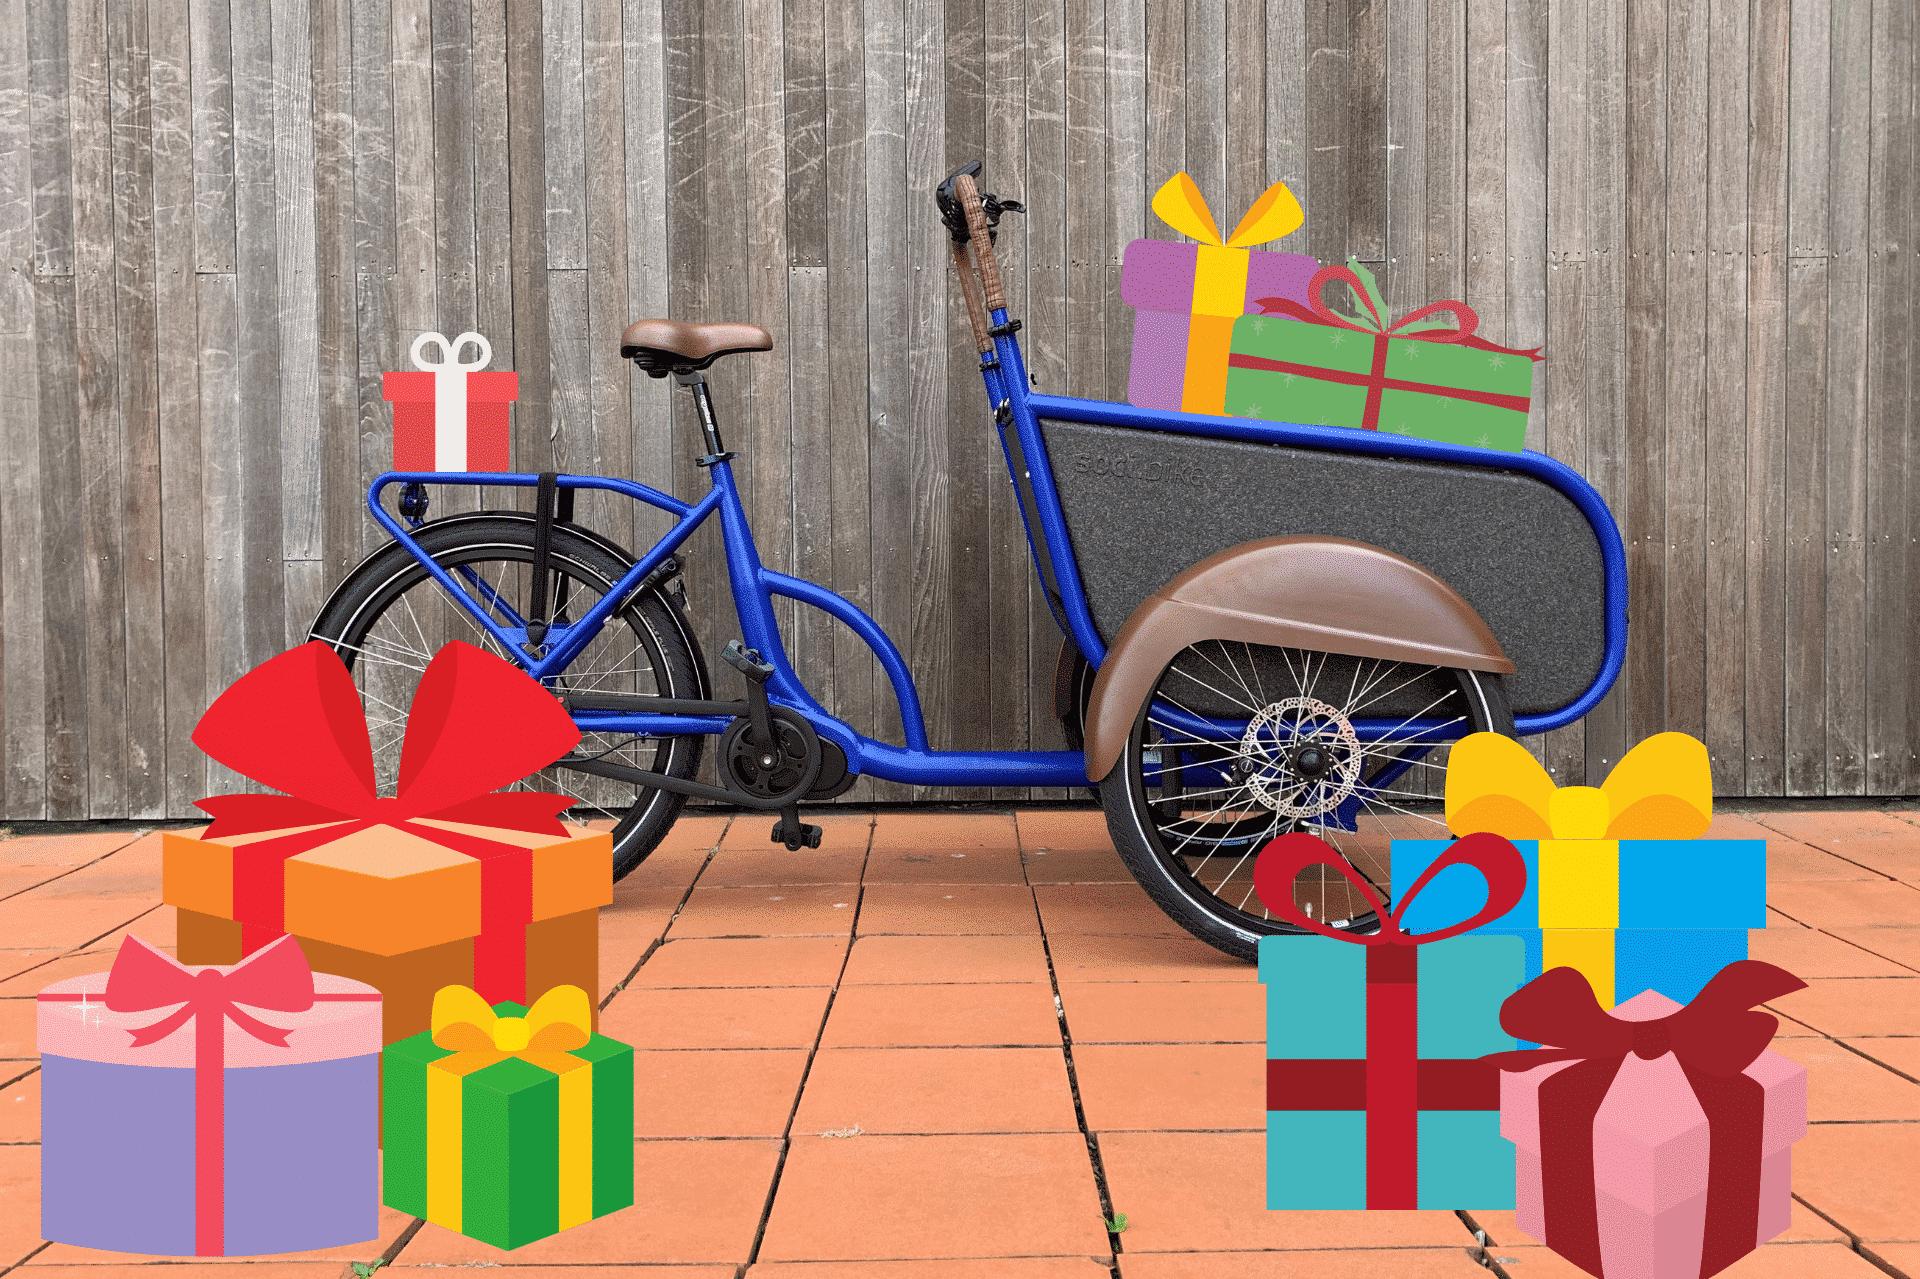 soci.bike cadeau-ideeën feestdagen